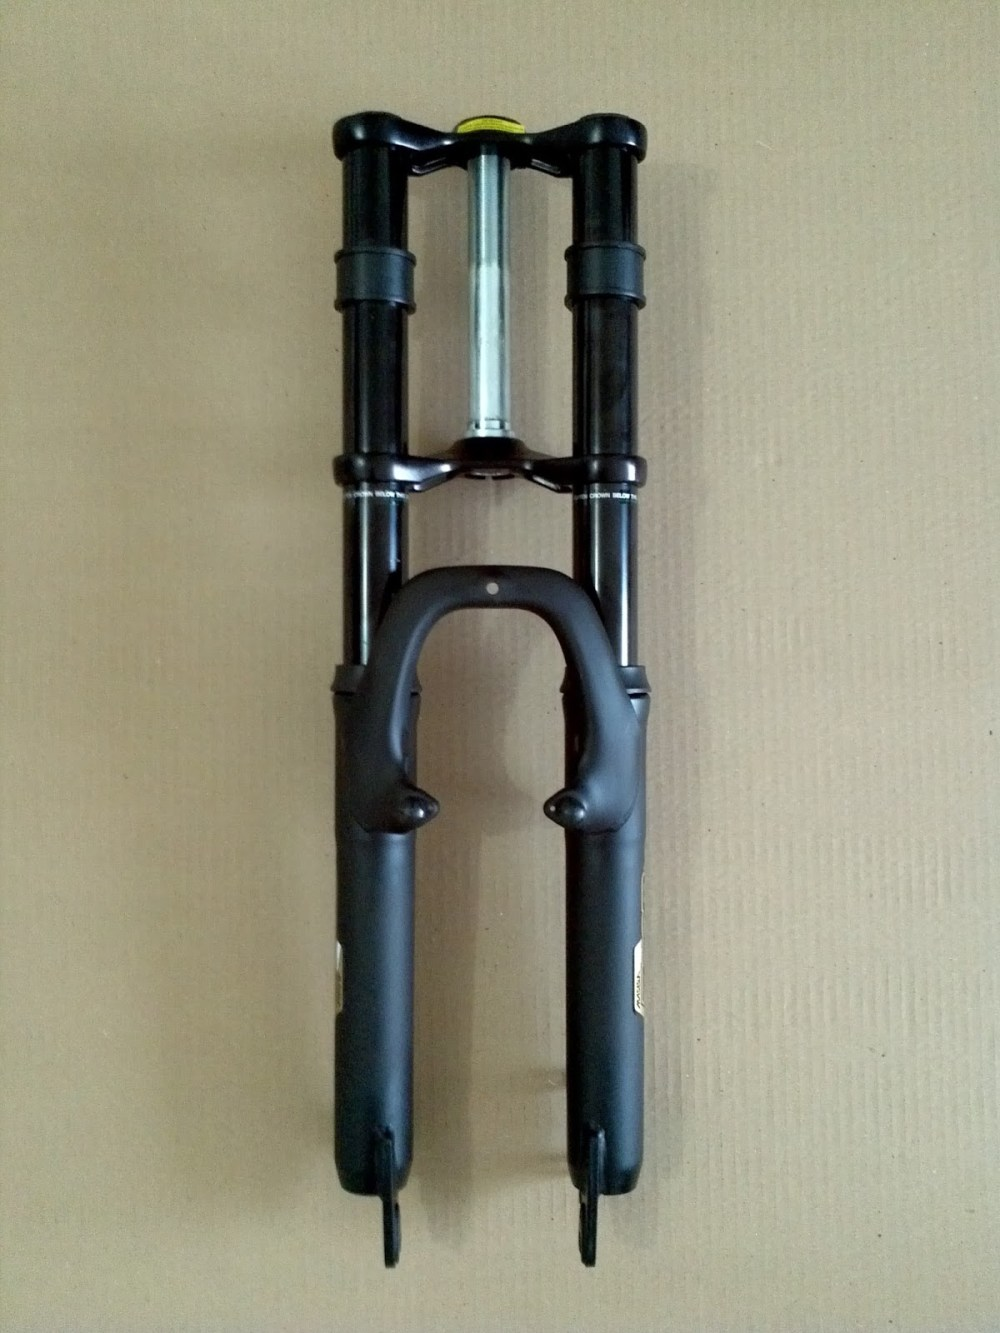 medium resolution of fitting a dirt bike fork onto a mountain bike frame triple tree